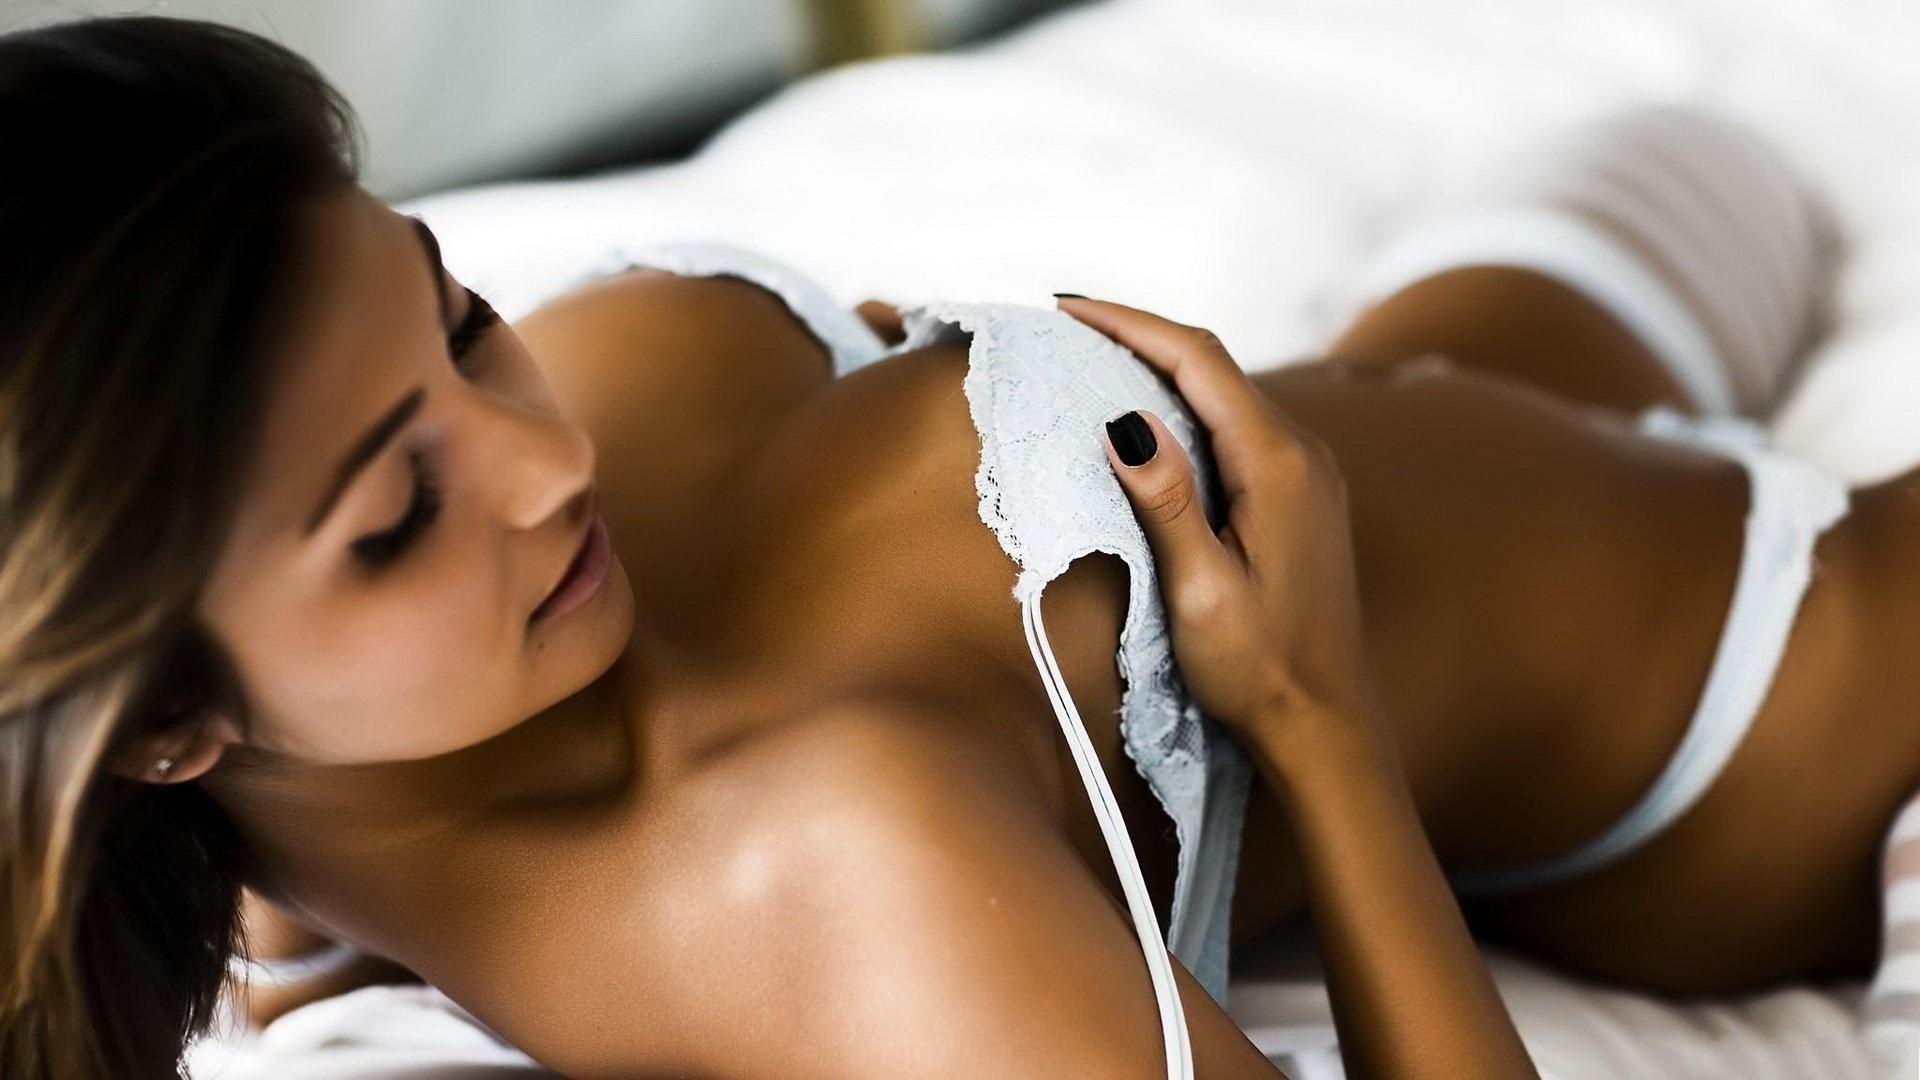 Hottest beauty hd nude comic